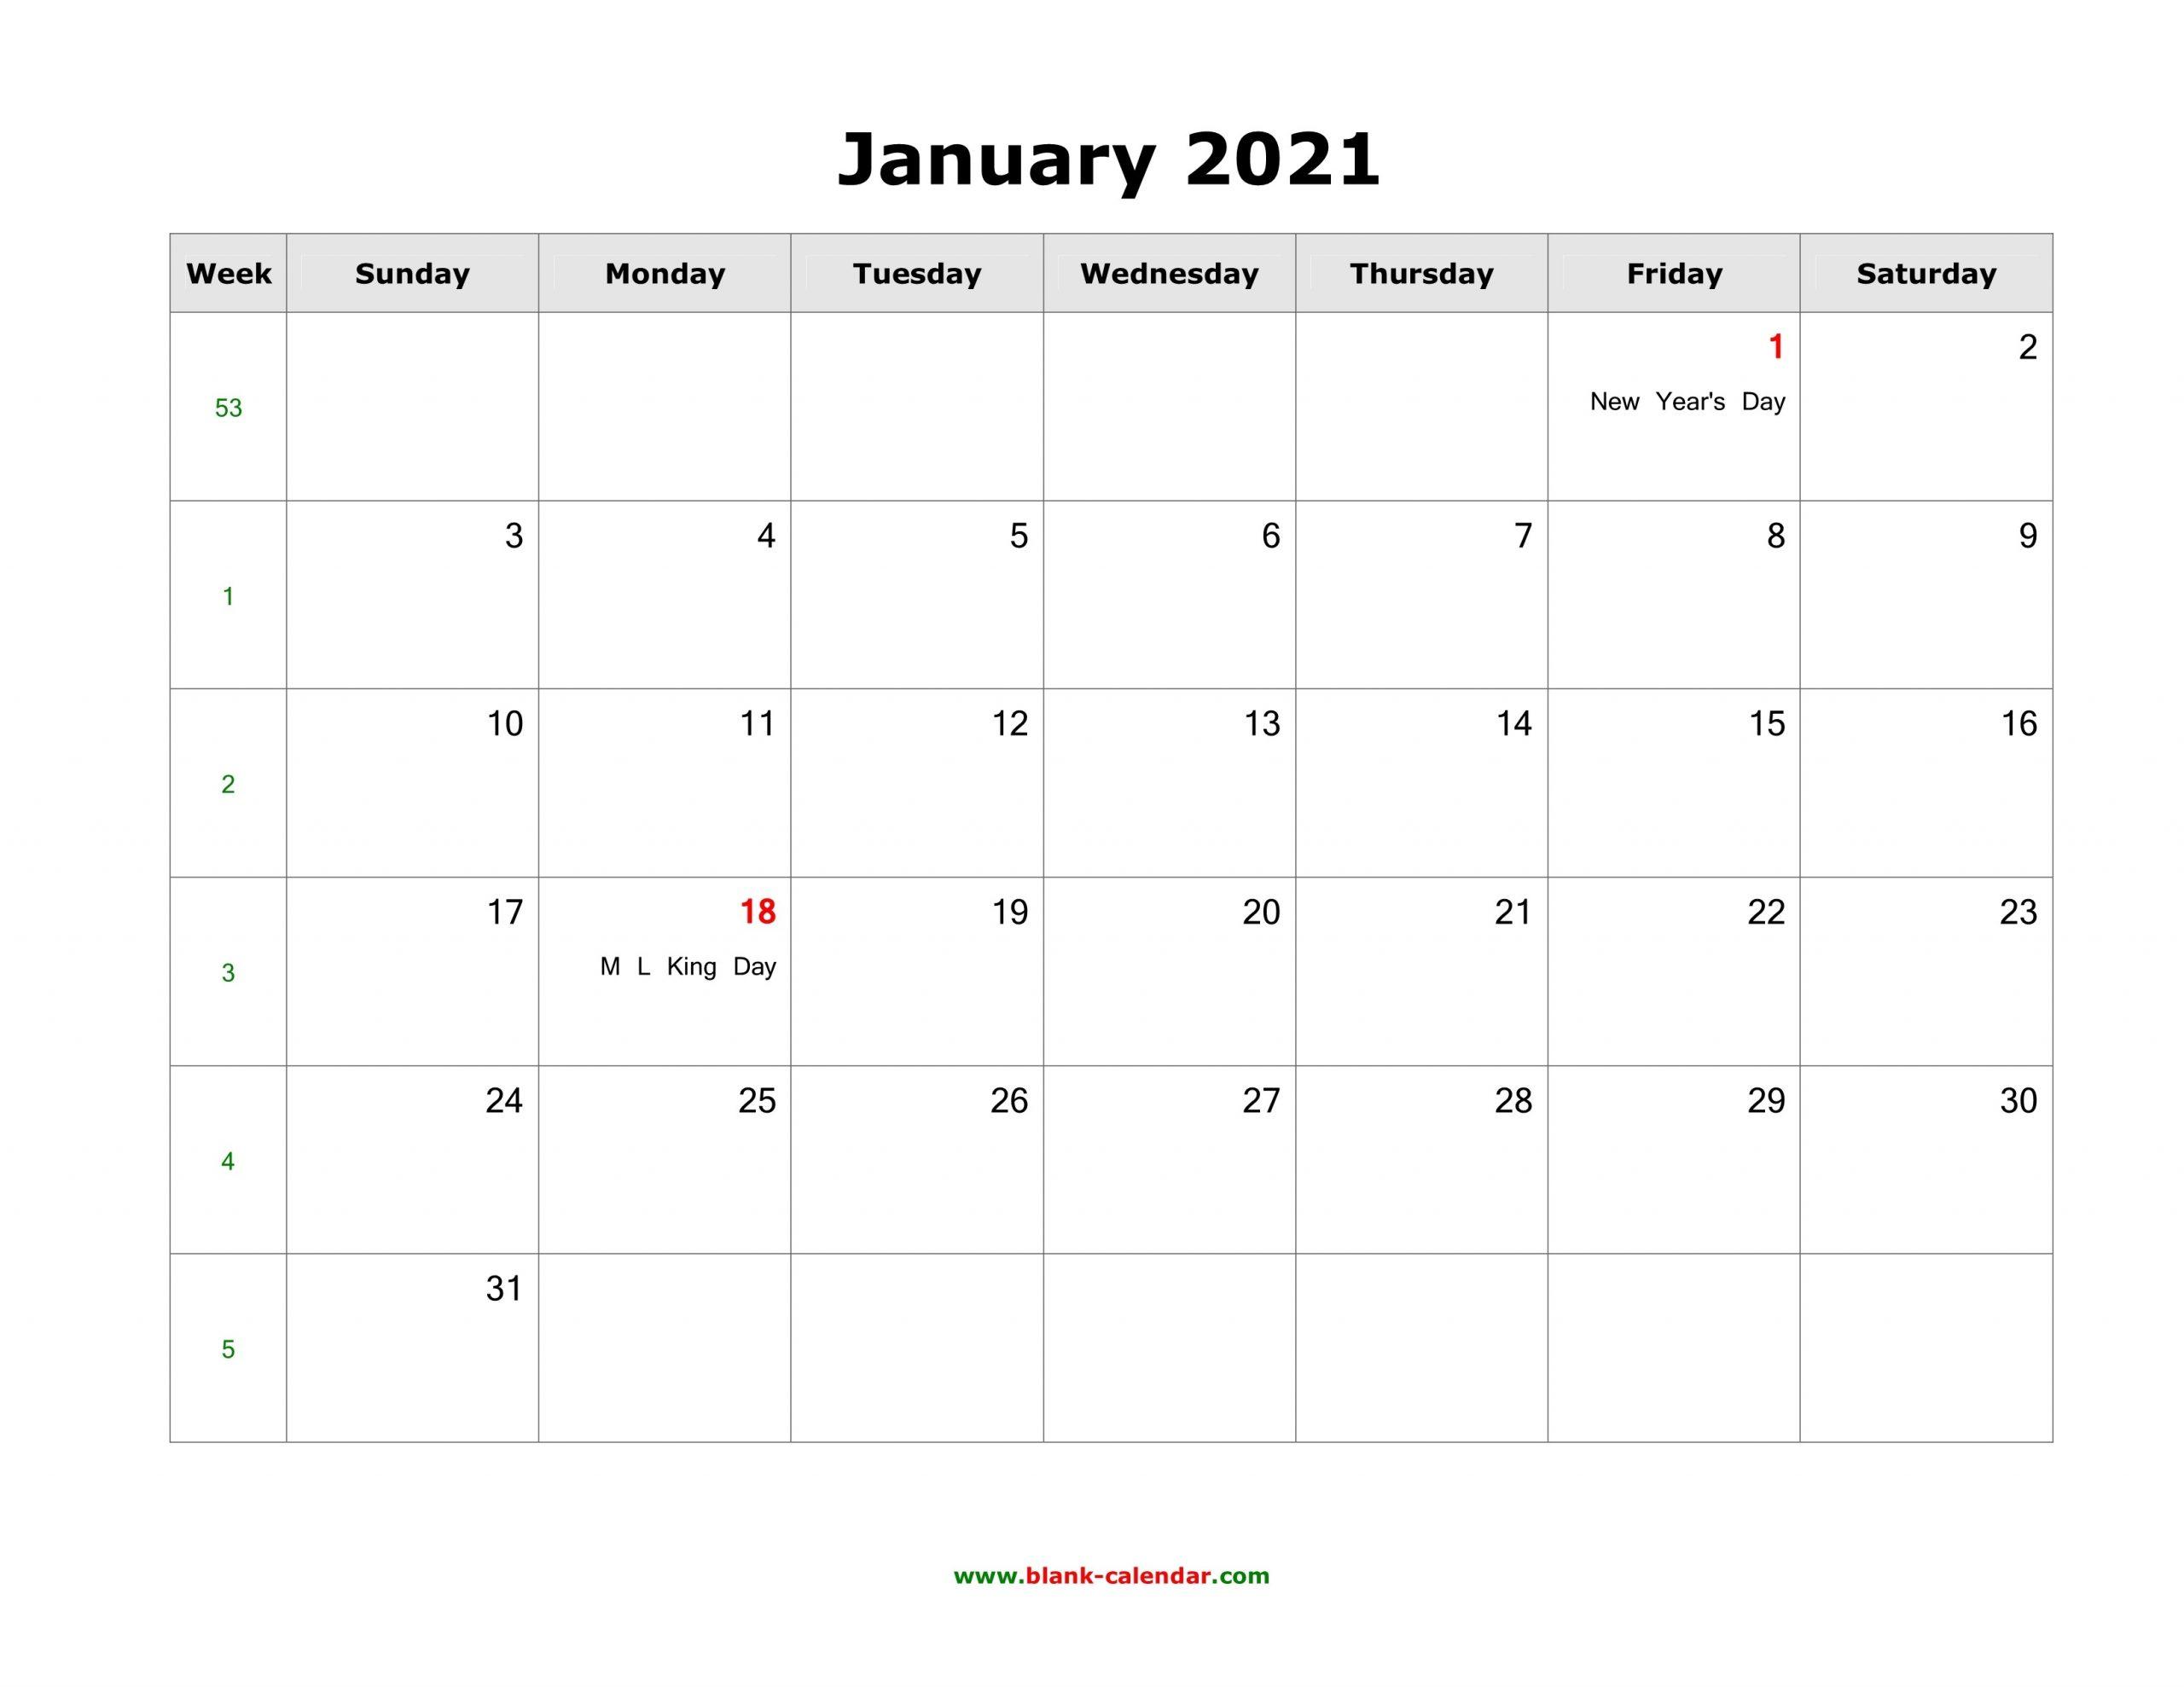 January 2021 Blank Calendar   Free Download Calendar Templates-Fill In Blank Calendar 2021